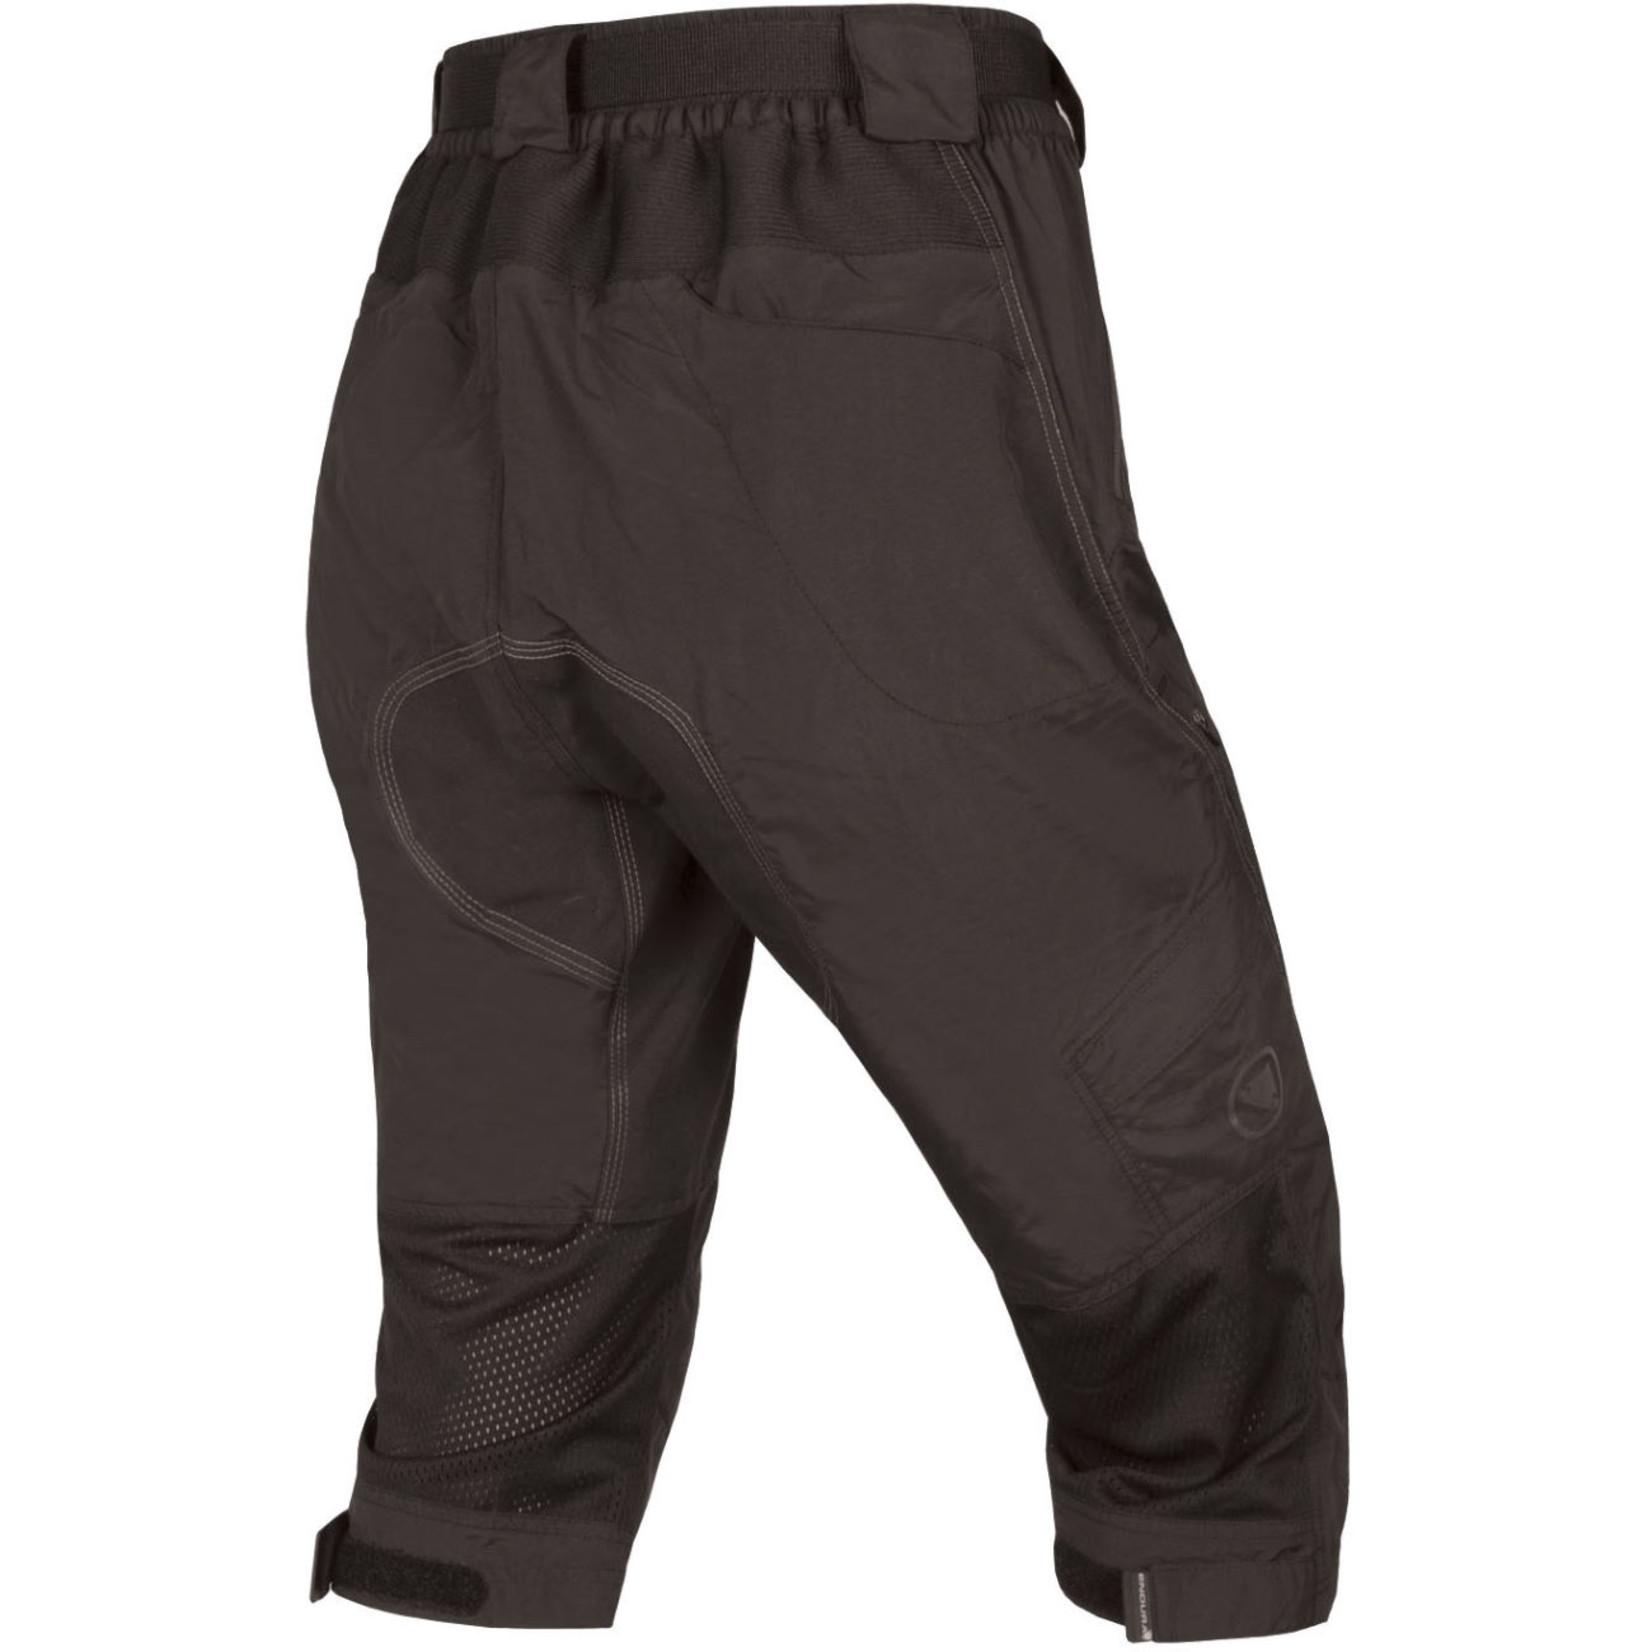 Endura Women's Hummvee II 3/4 Length Shorts - Black (Medium)